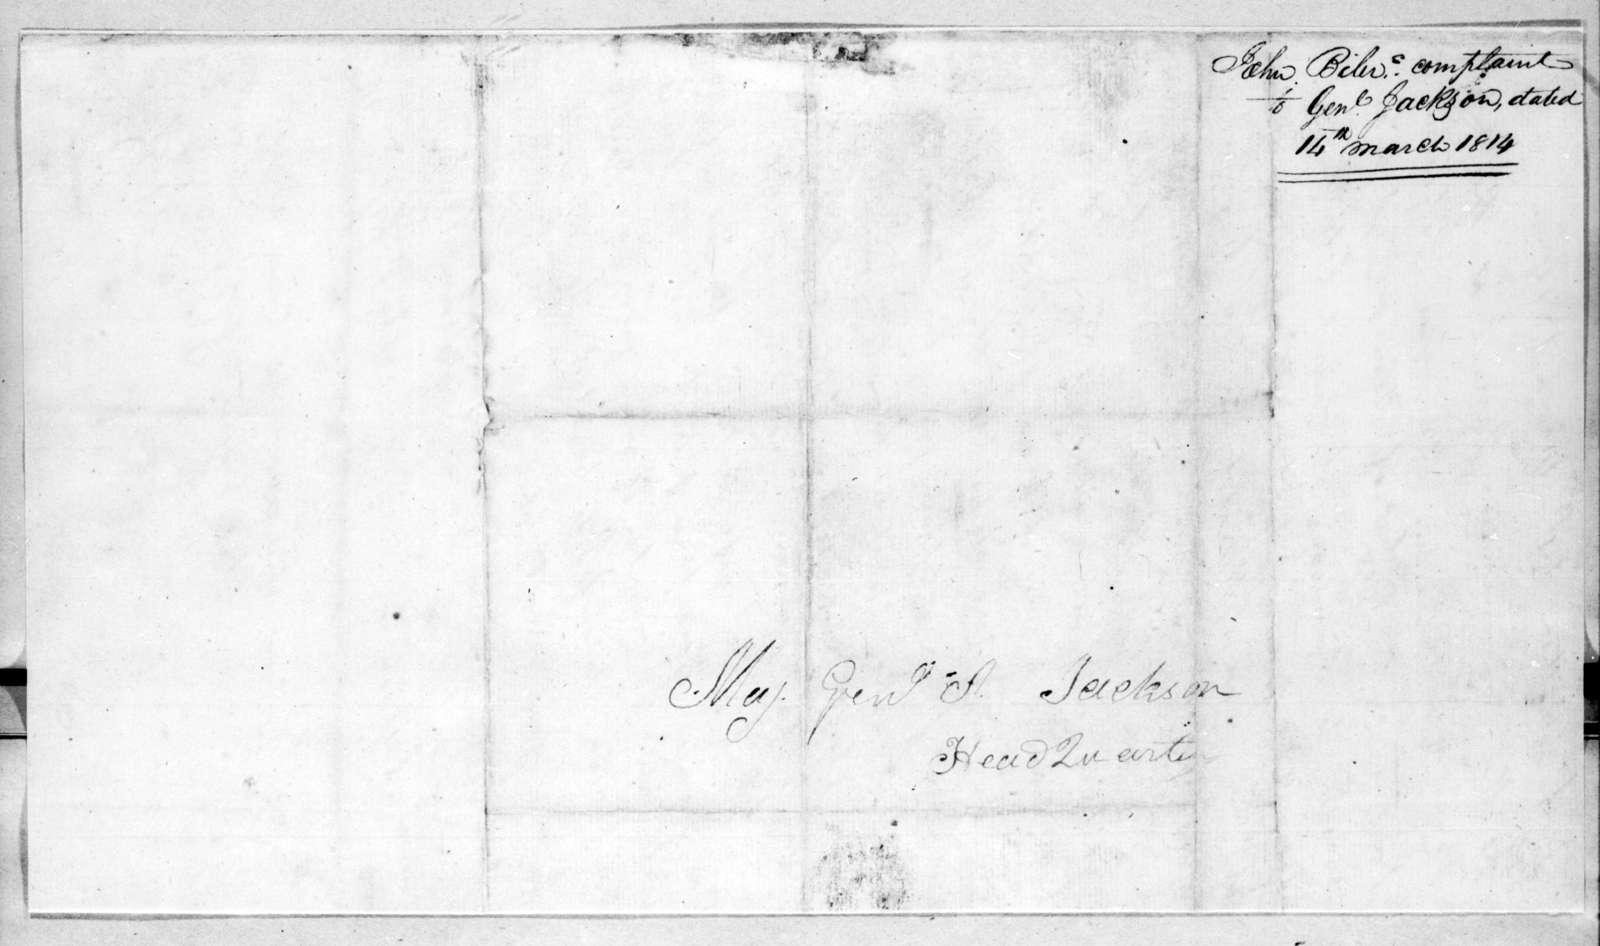 John Byler to Andrew Jackson, March 14, 1814